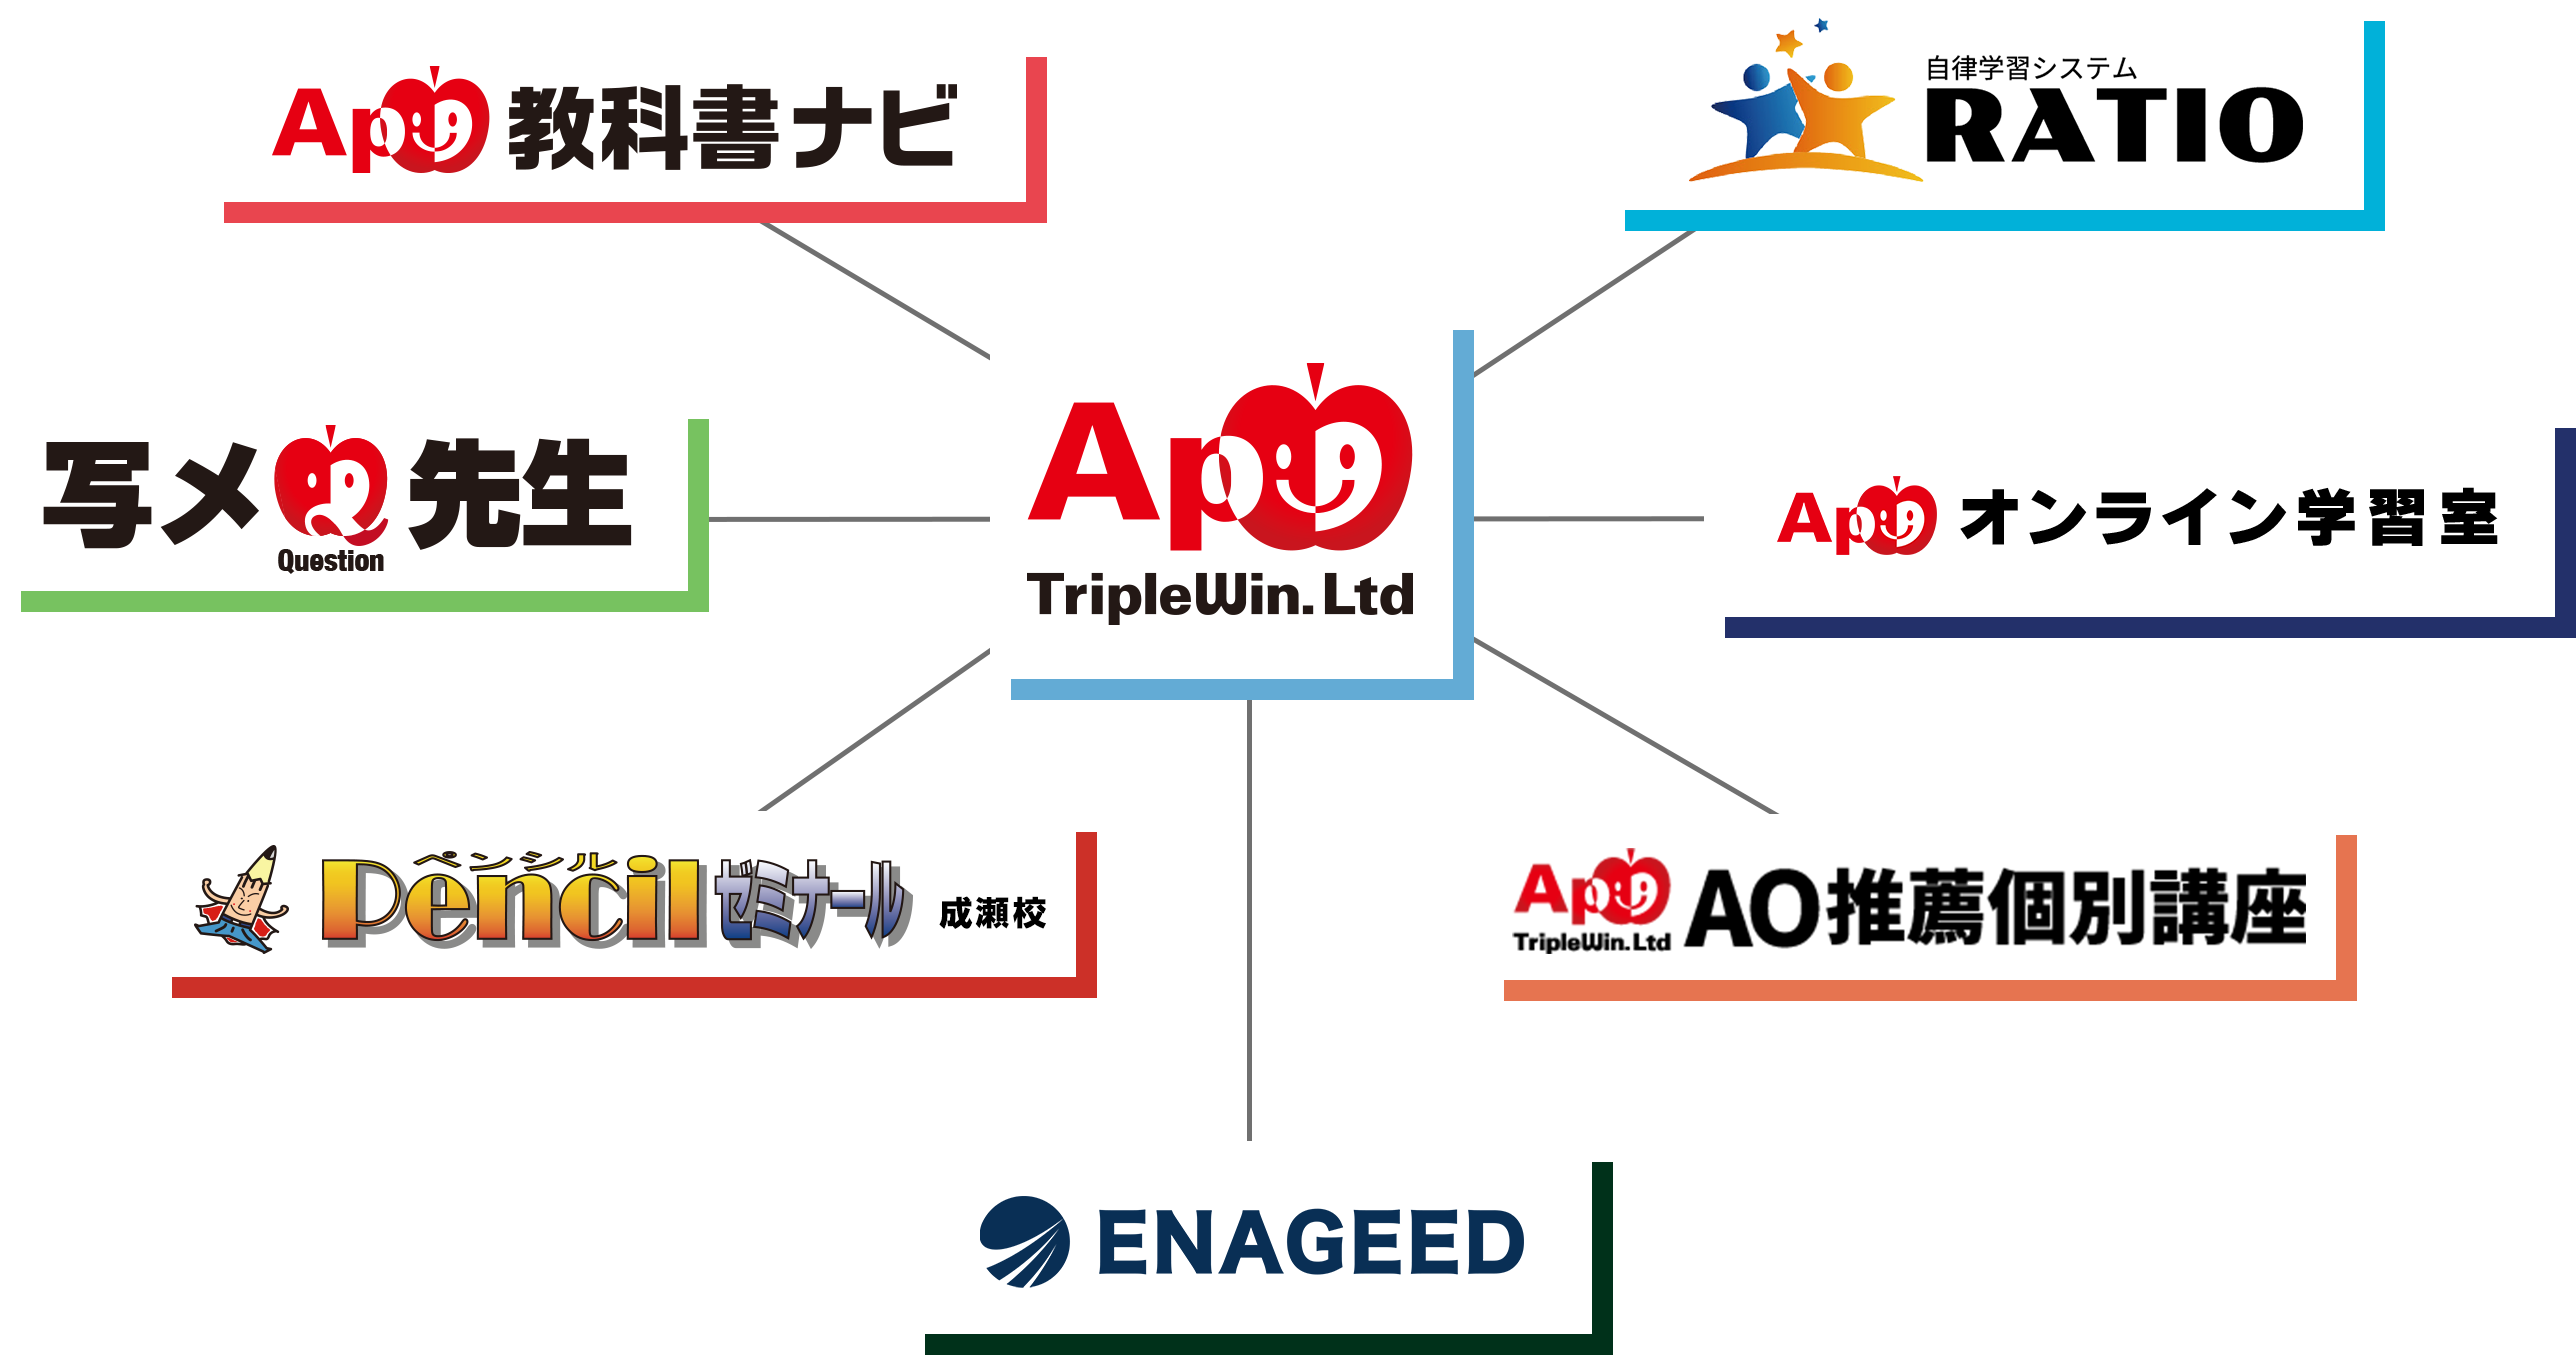 TripleWin.Ltd 公式ホームページサービスイメージ図